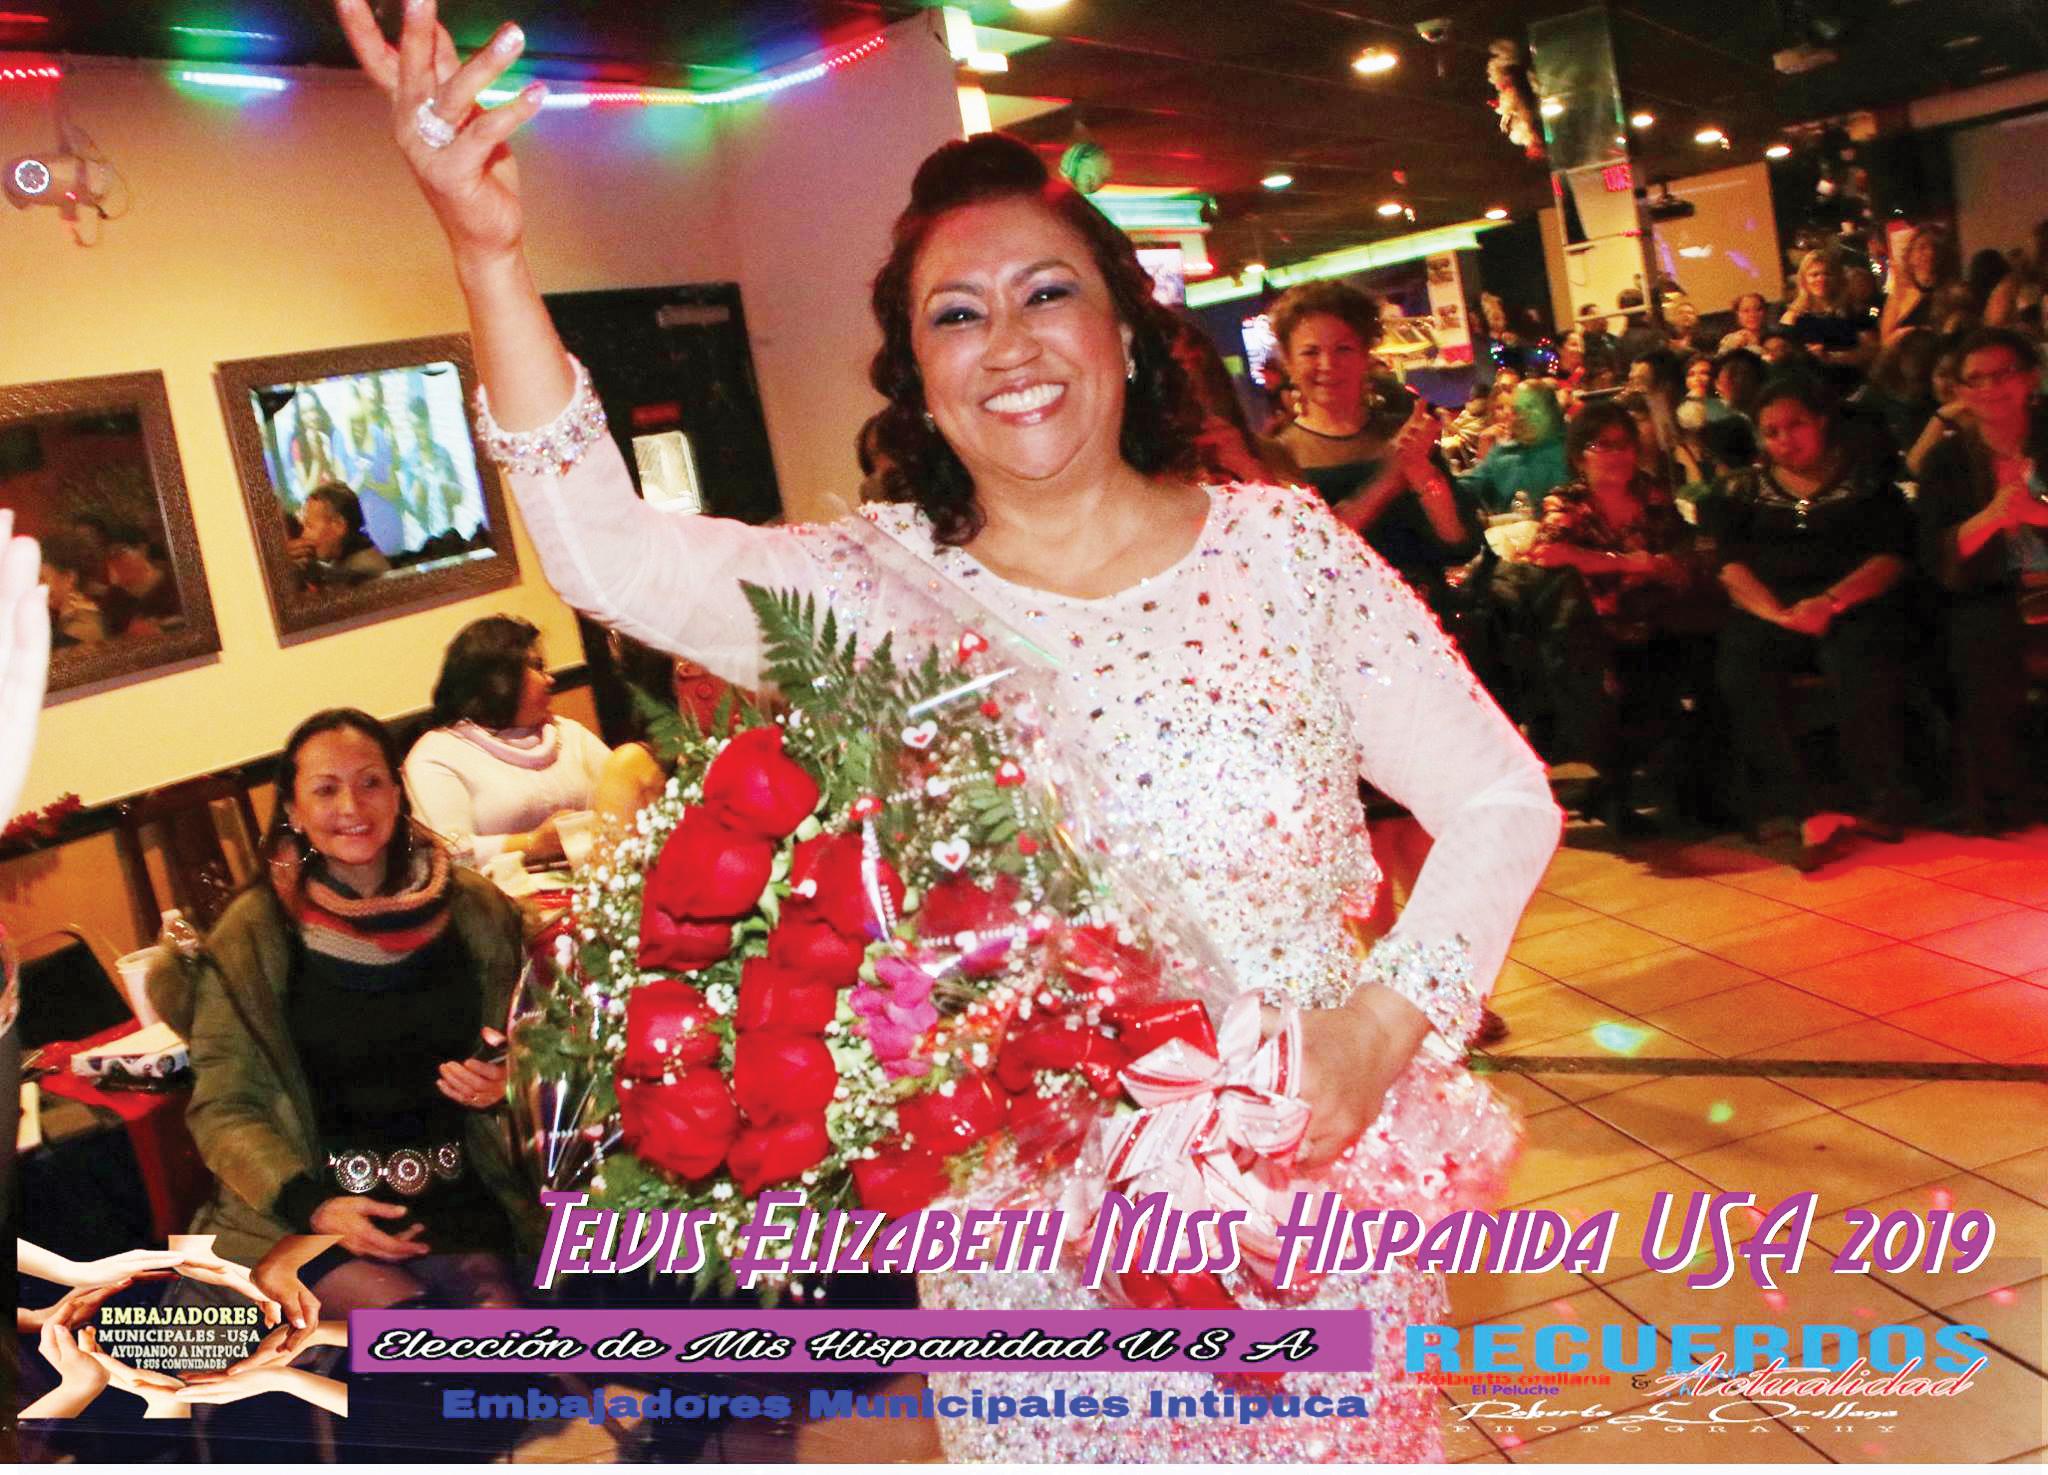 Elijen a Telvis Elizabeth  Miss Hispanidad USA